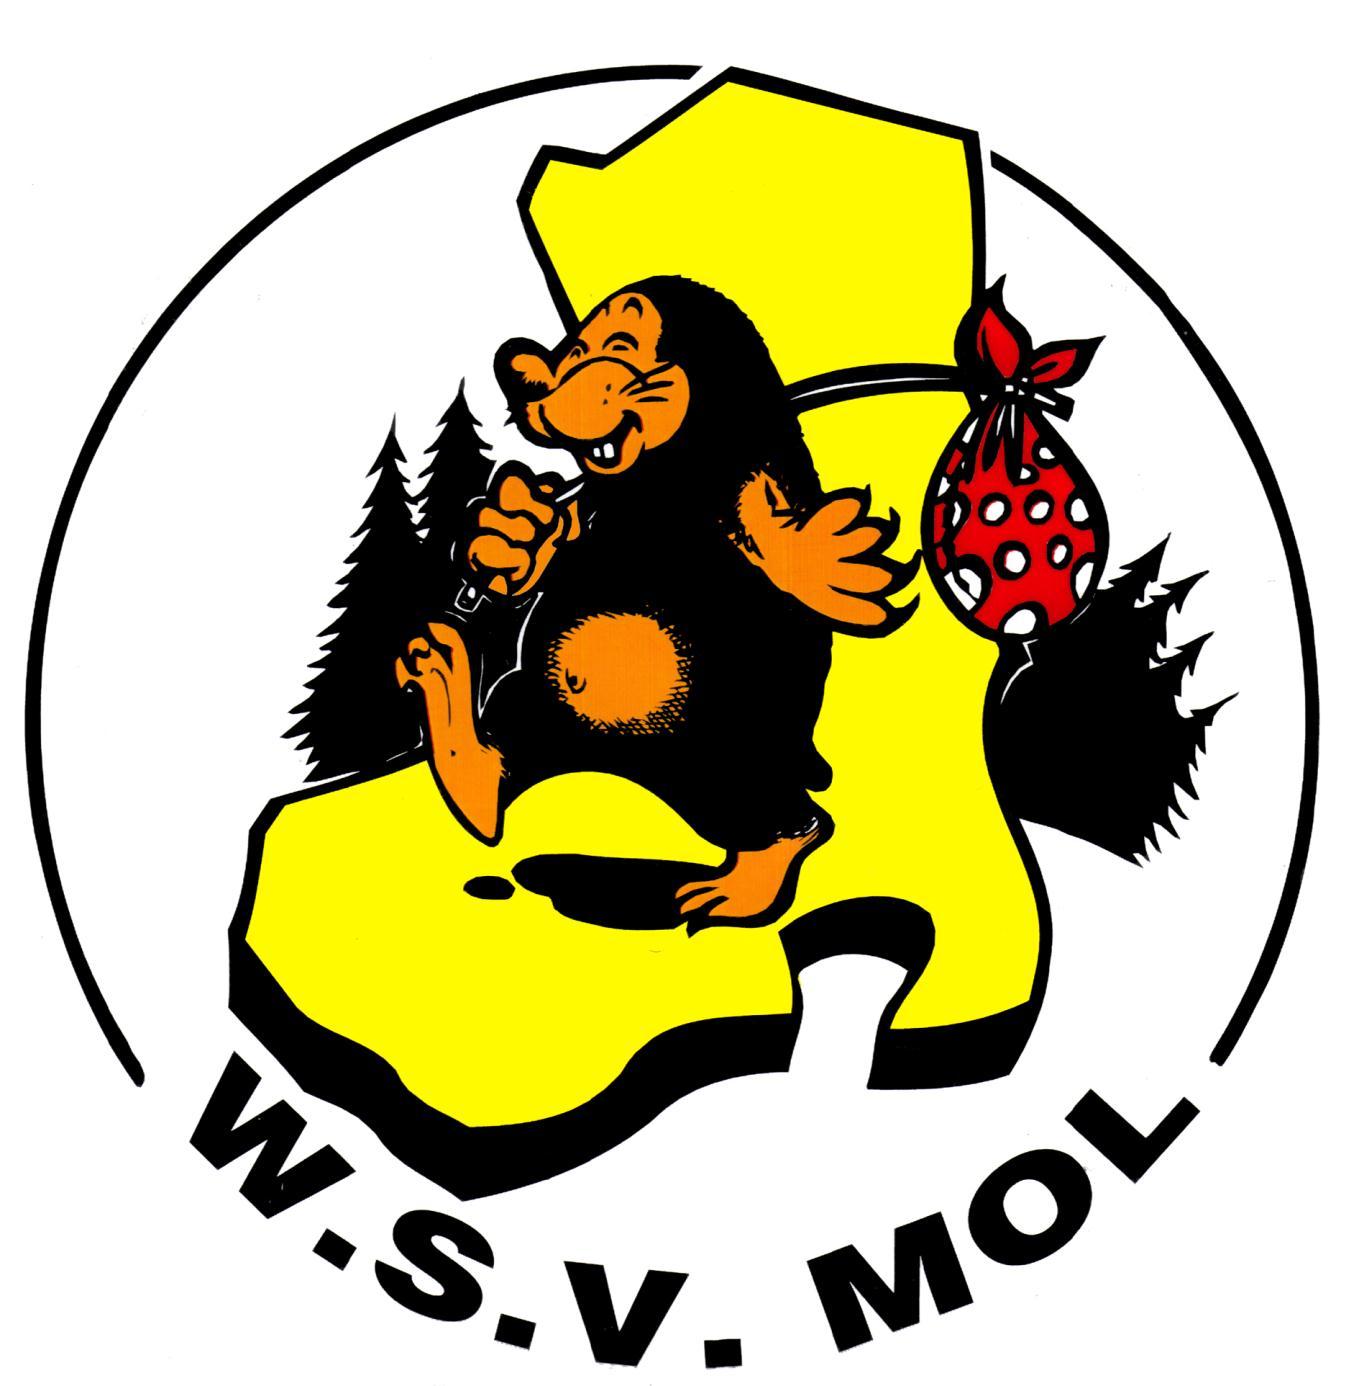 W.S.V. Mol